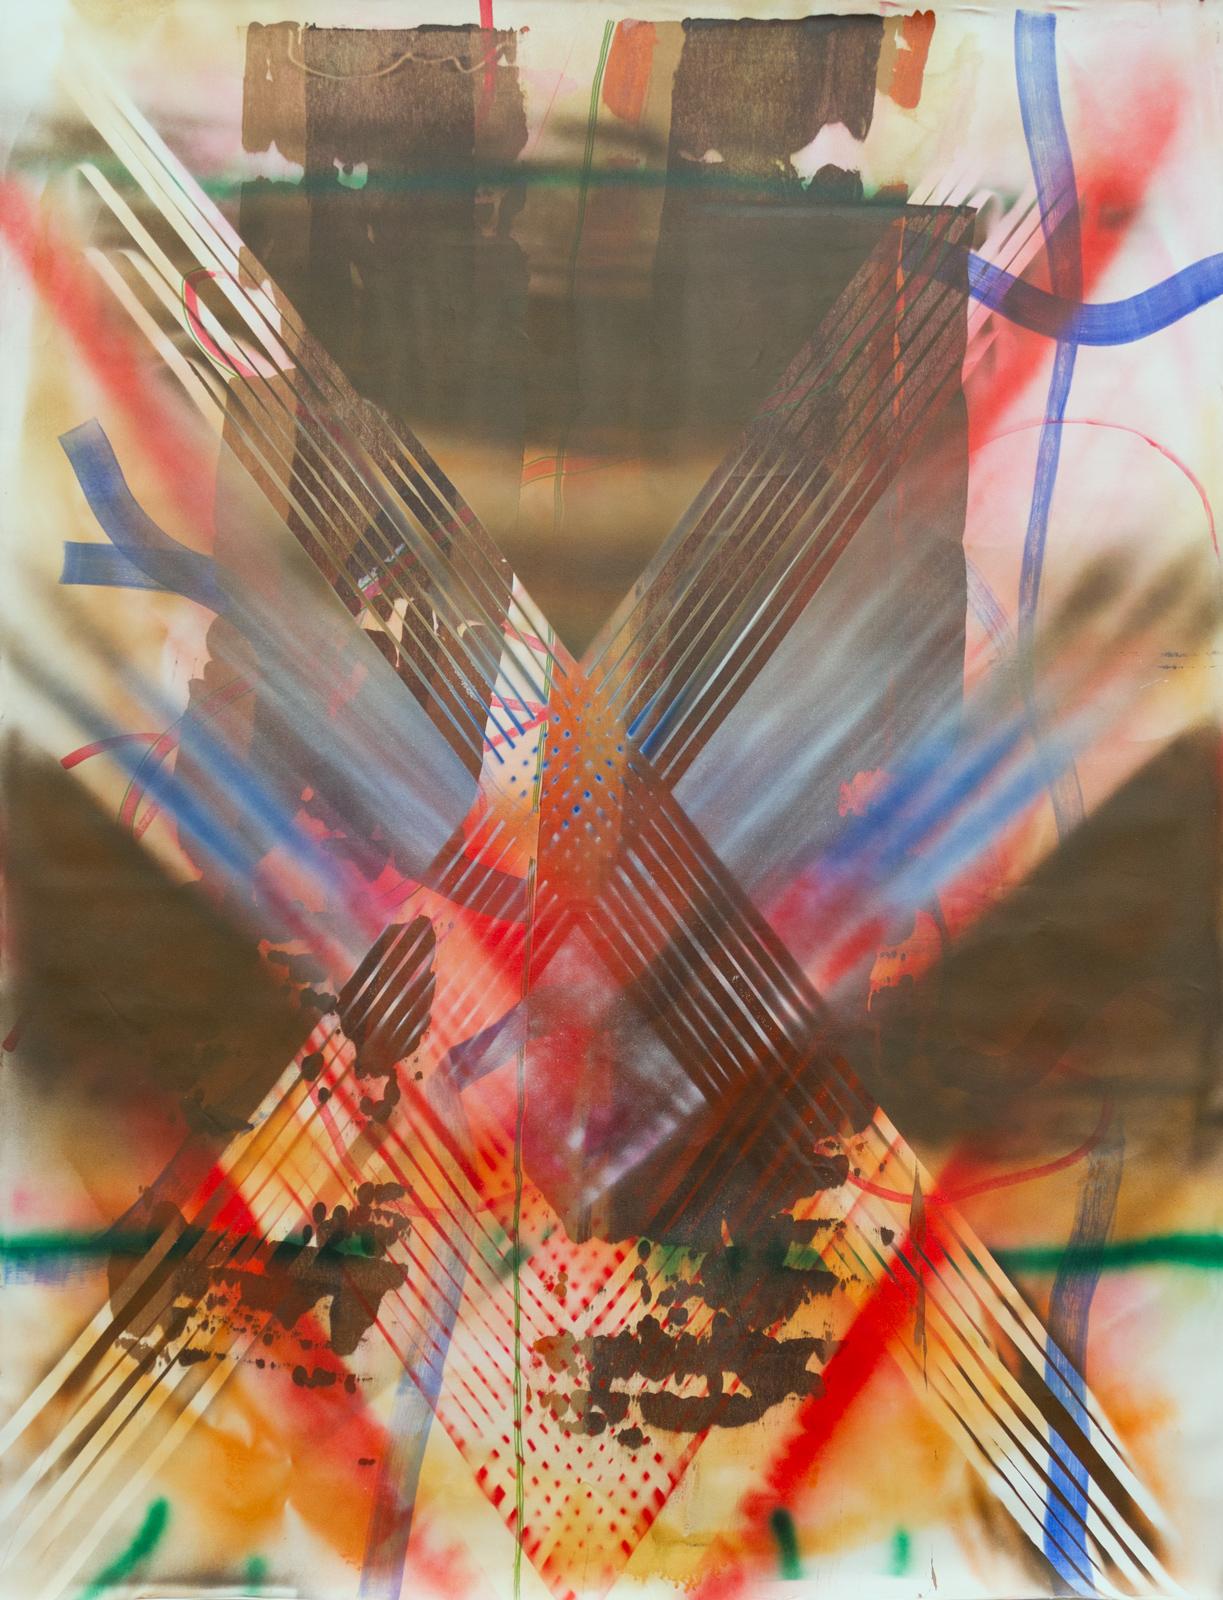 Overspray, acrylic on canvas, 90 x 68 inches